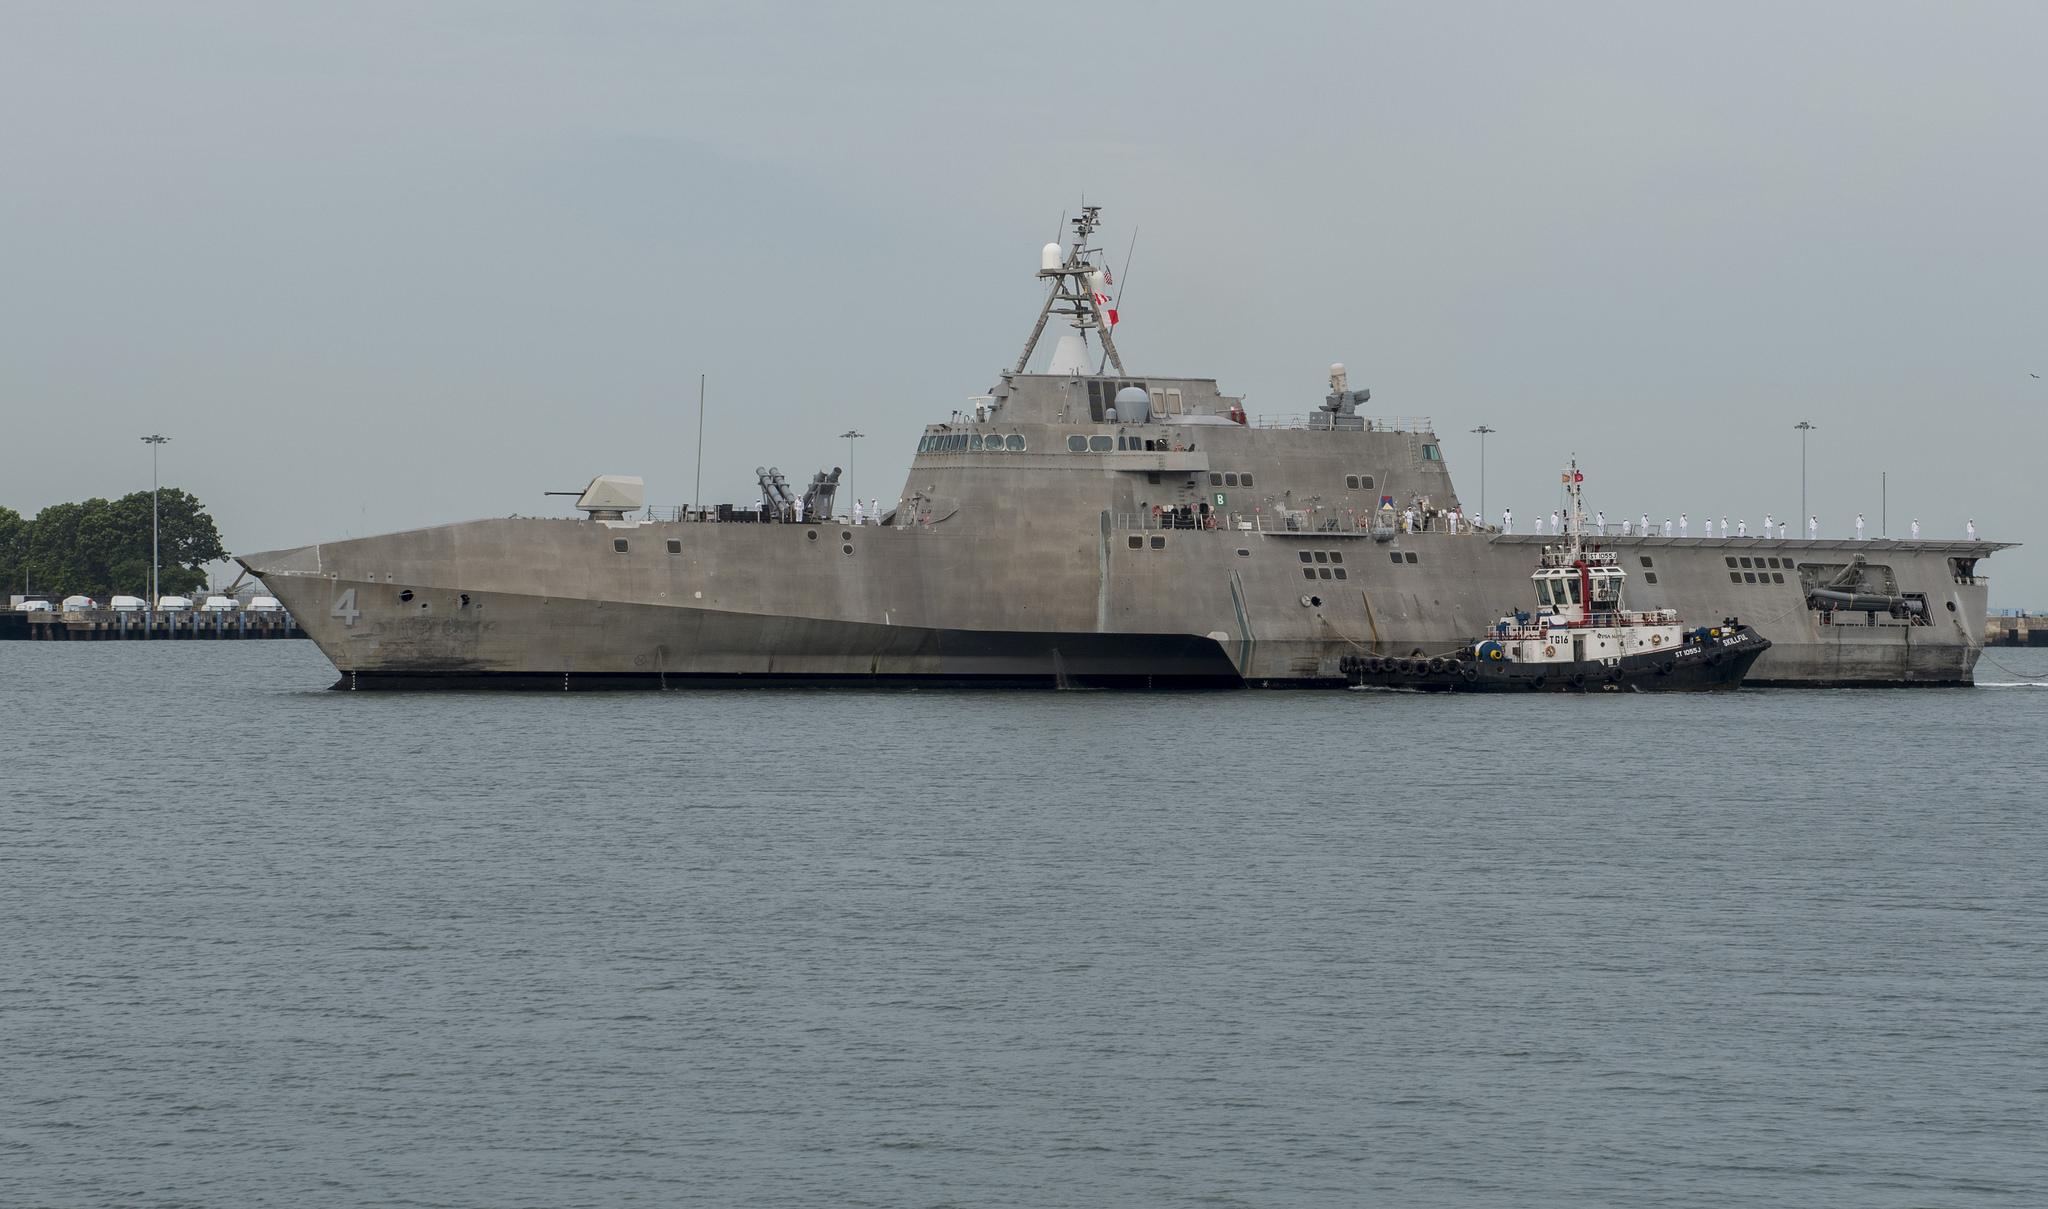 USS CORONADO LCS-4 Einlaufen Singapur am 16.10.2016 Bild: U.S. Navy